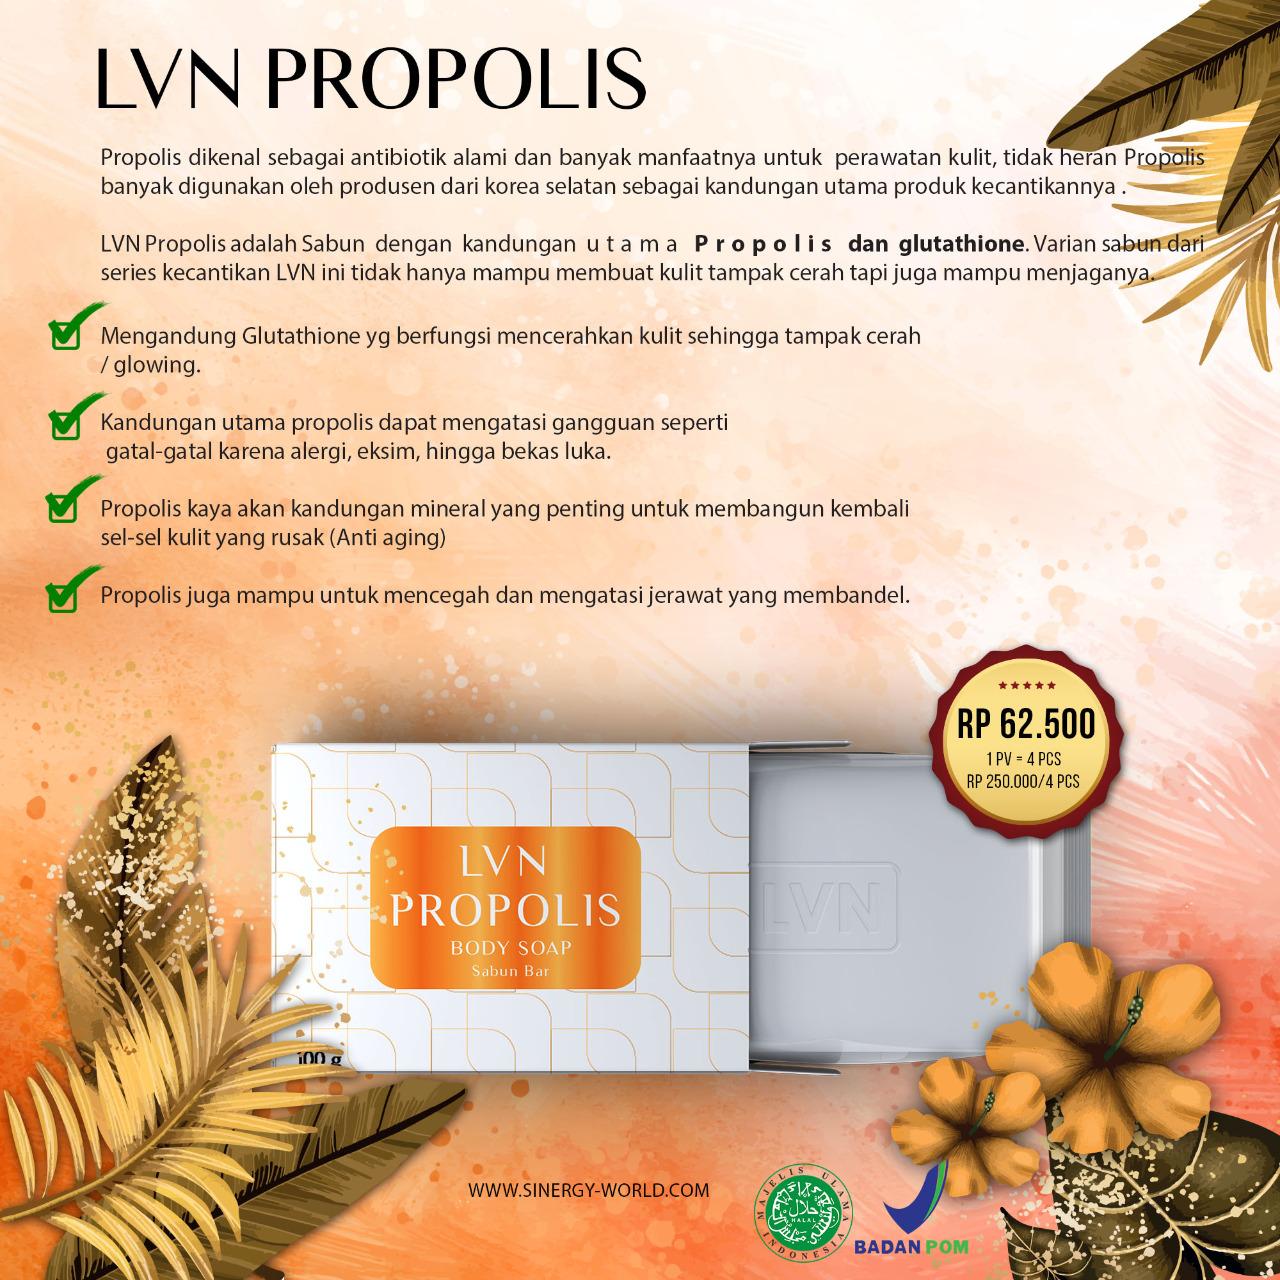 LVN Propolis body soap